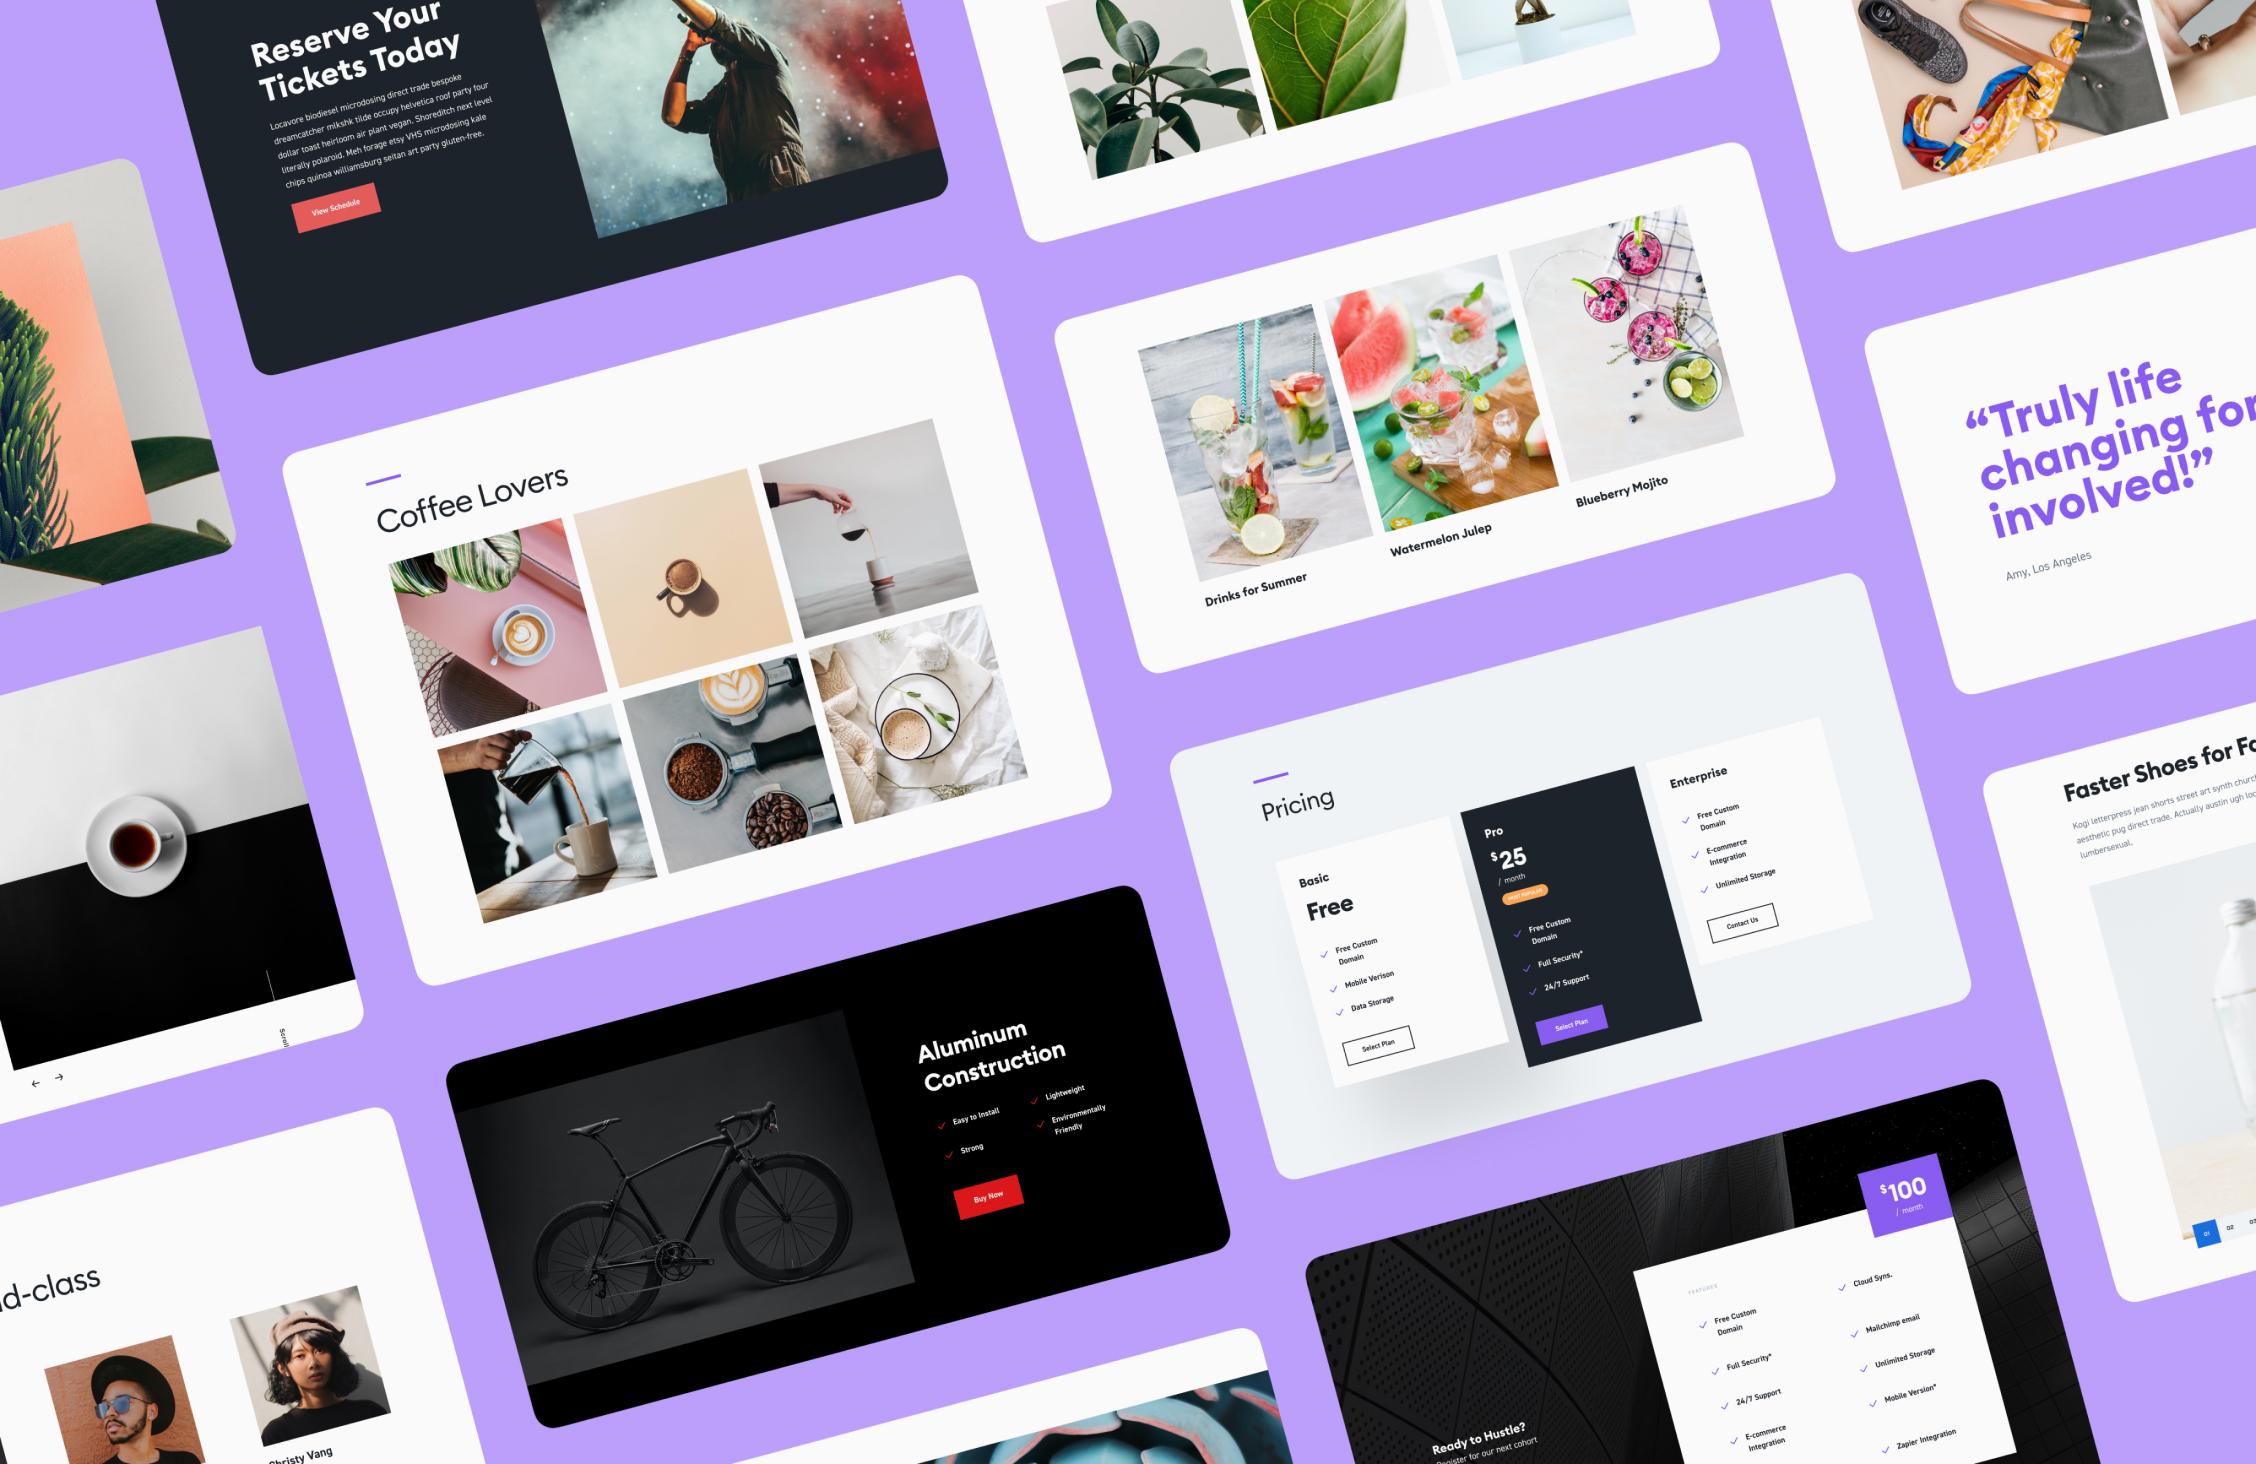 Websites that Design Themselves